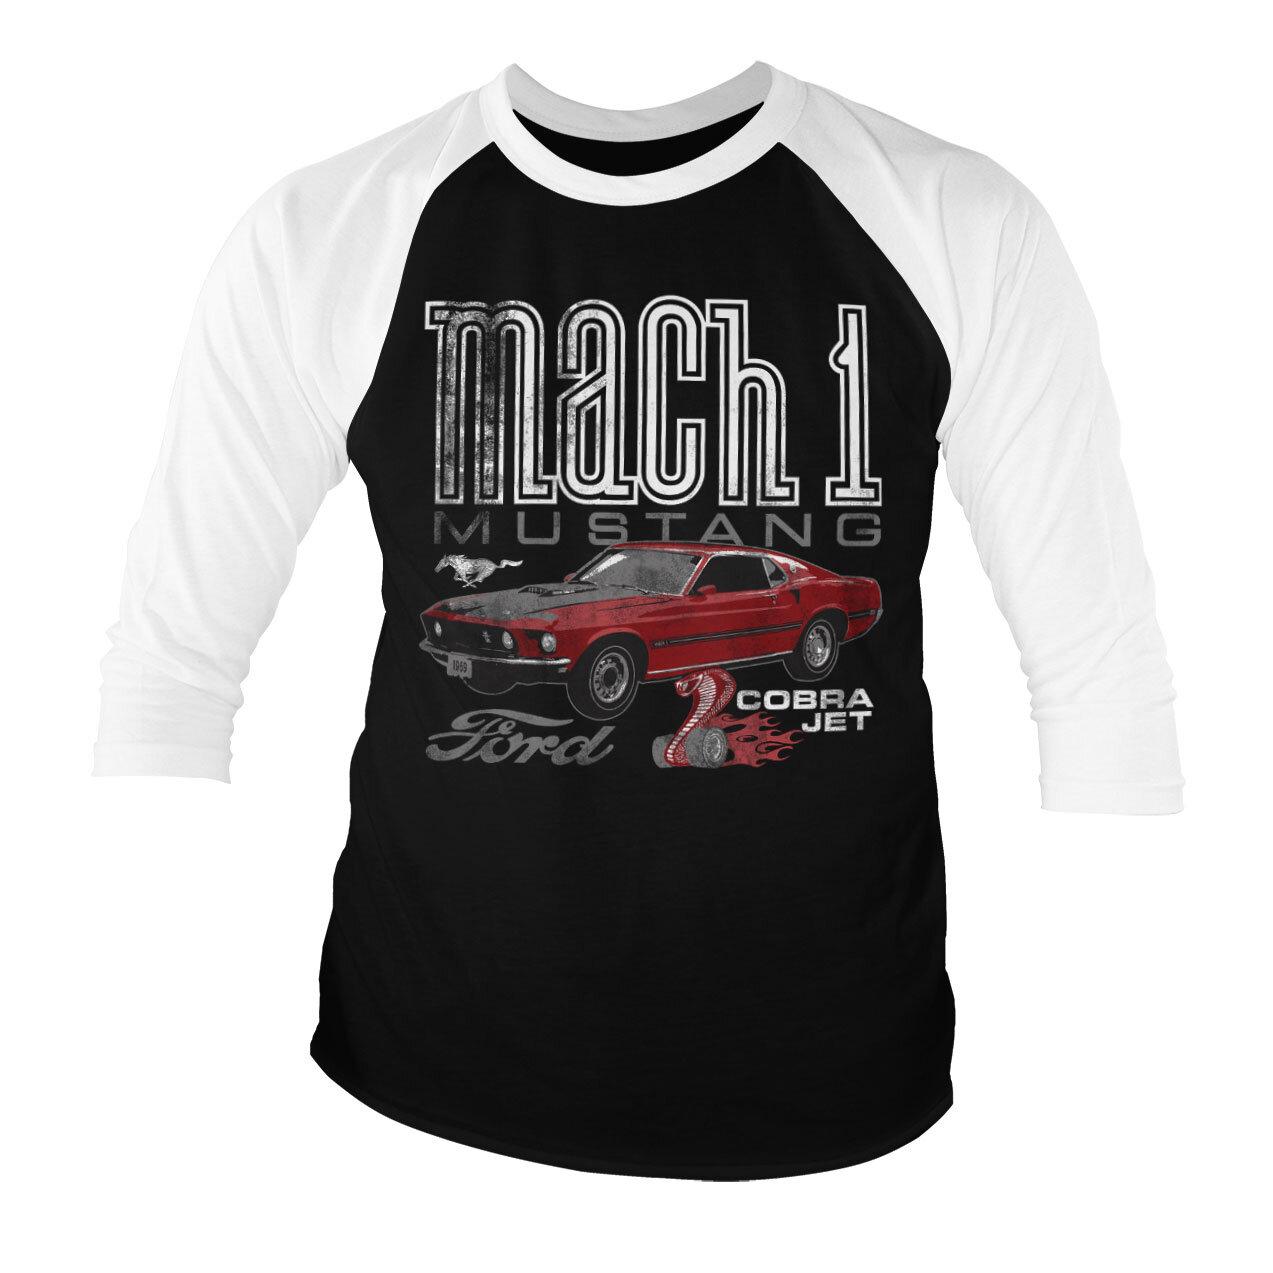 Ford Mach-1 Mustang Baseball 3/4 Sleeve Tee